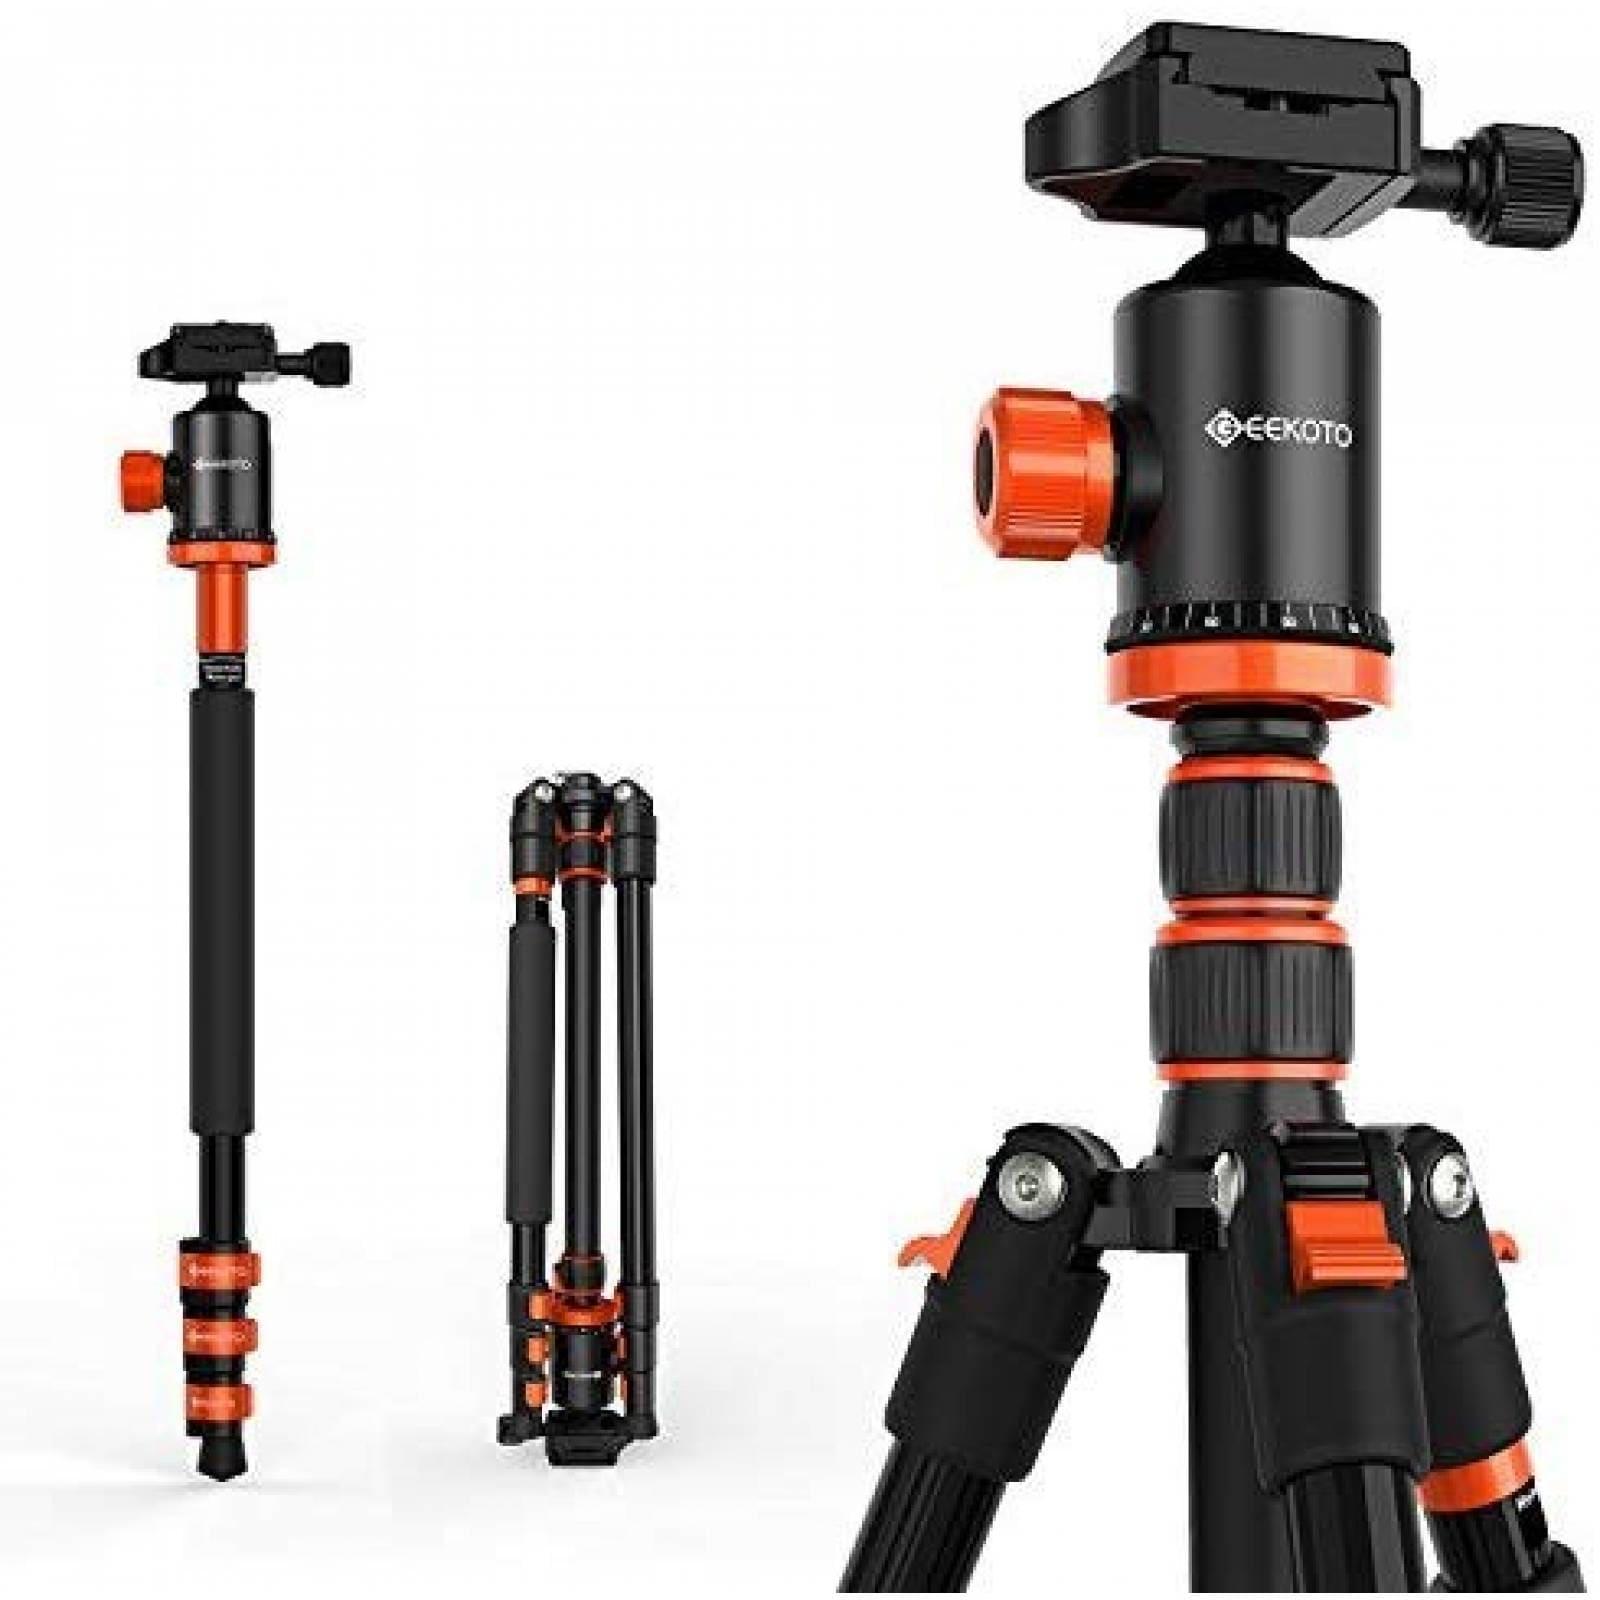 "Trípode GEEKOTO para cámara DSLR 77"" aluminio -negro/naranja"